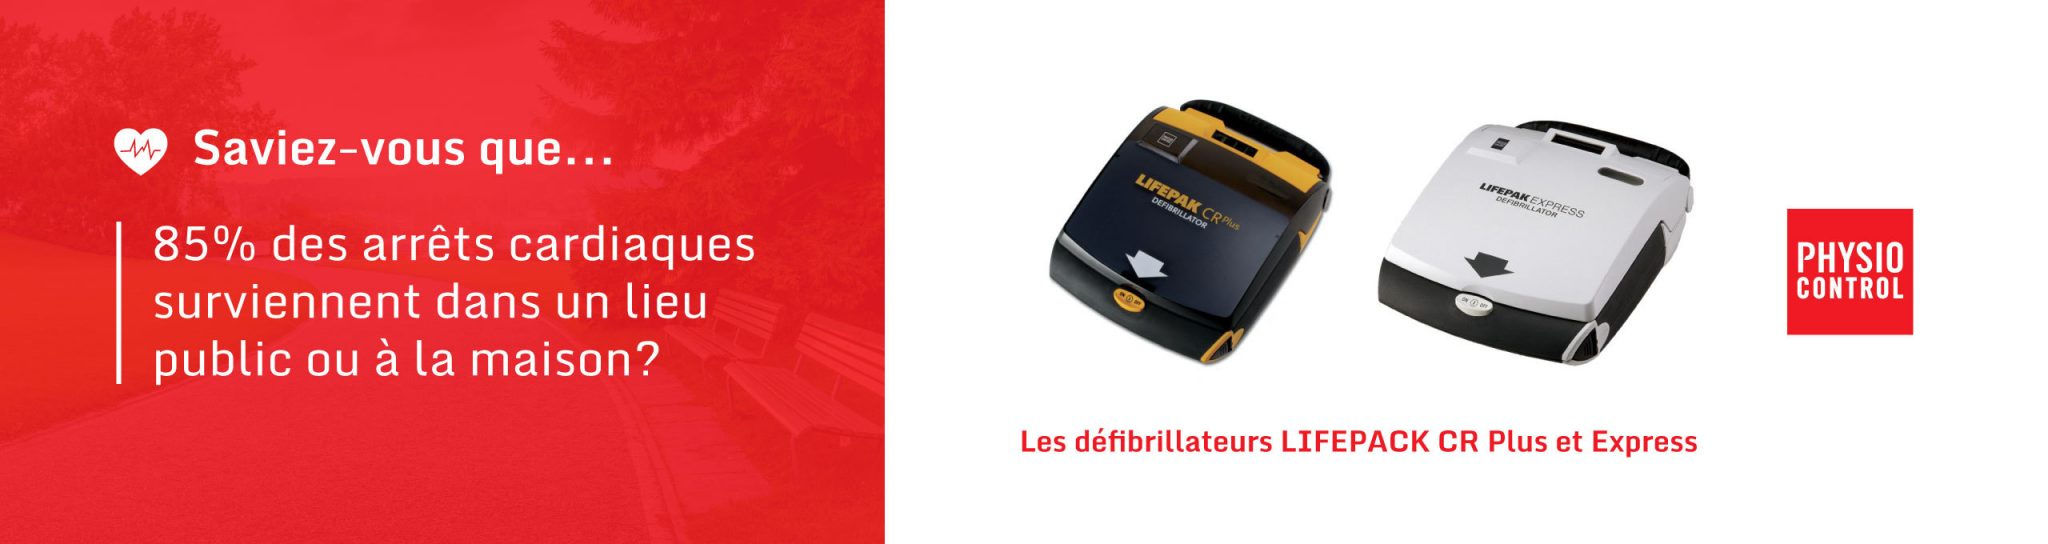 Les EMO-defibrillateurs-